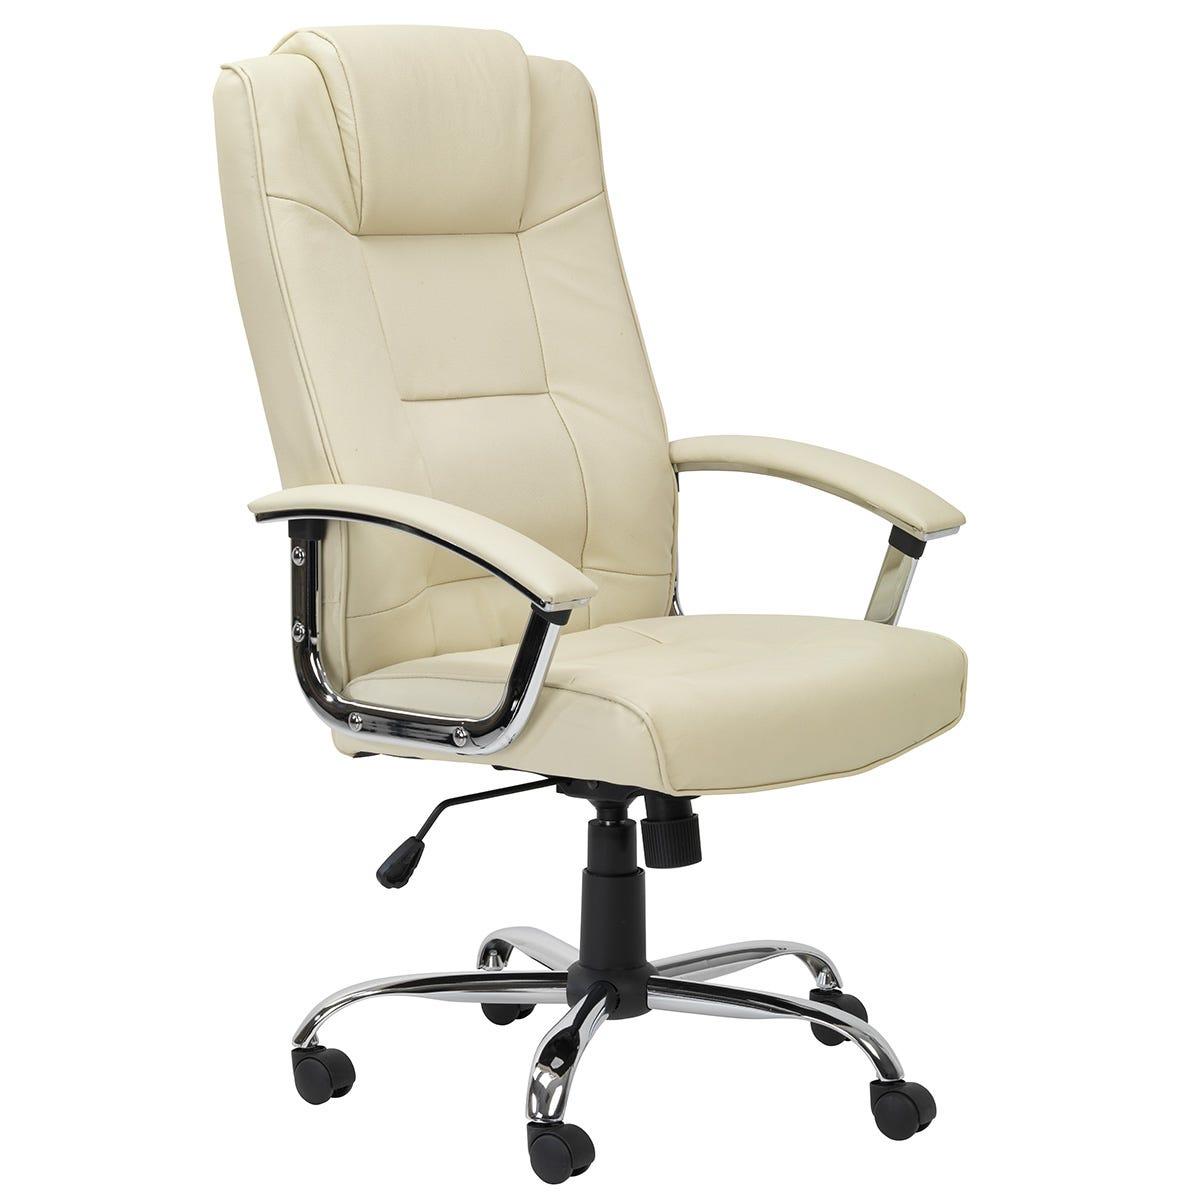 Alphason Houston Leather Office Chair - Cream